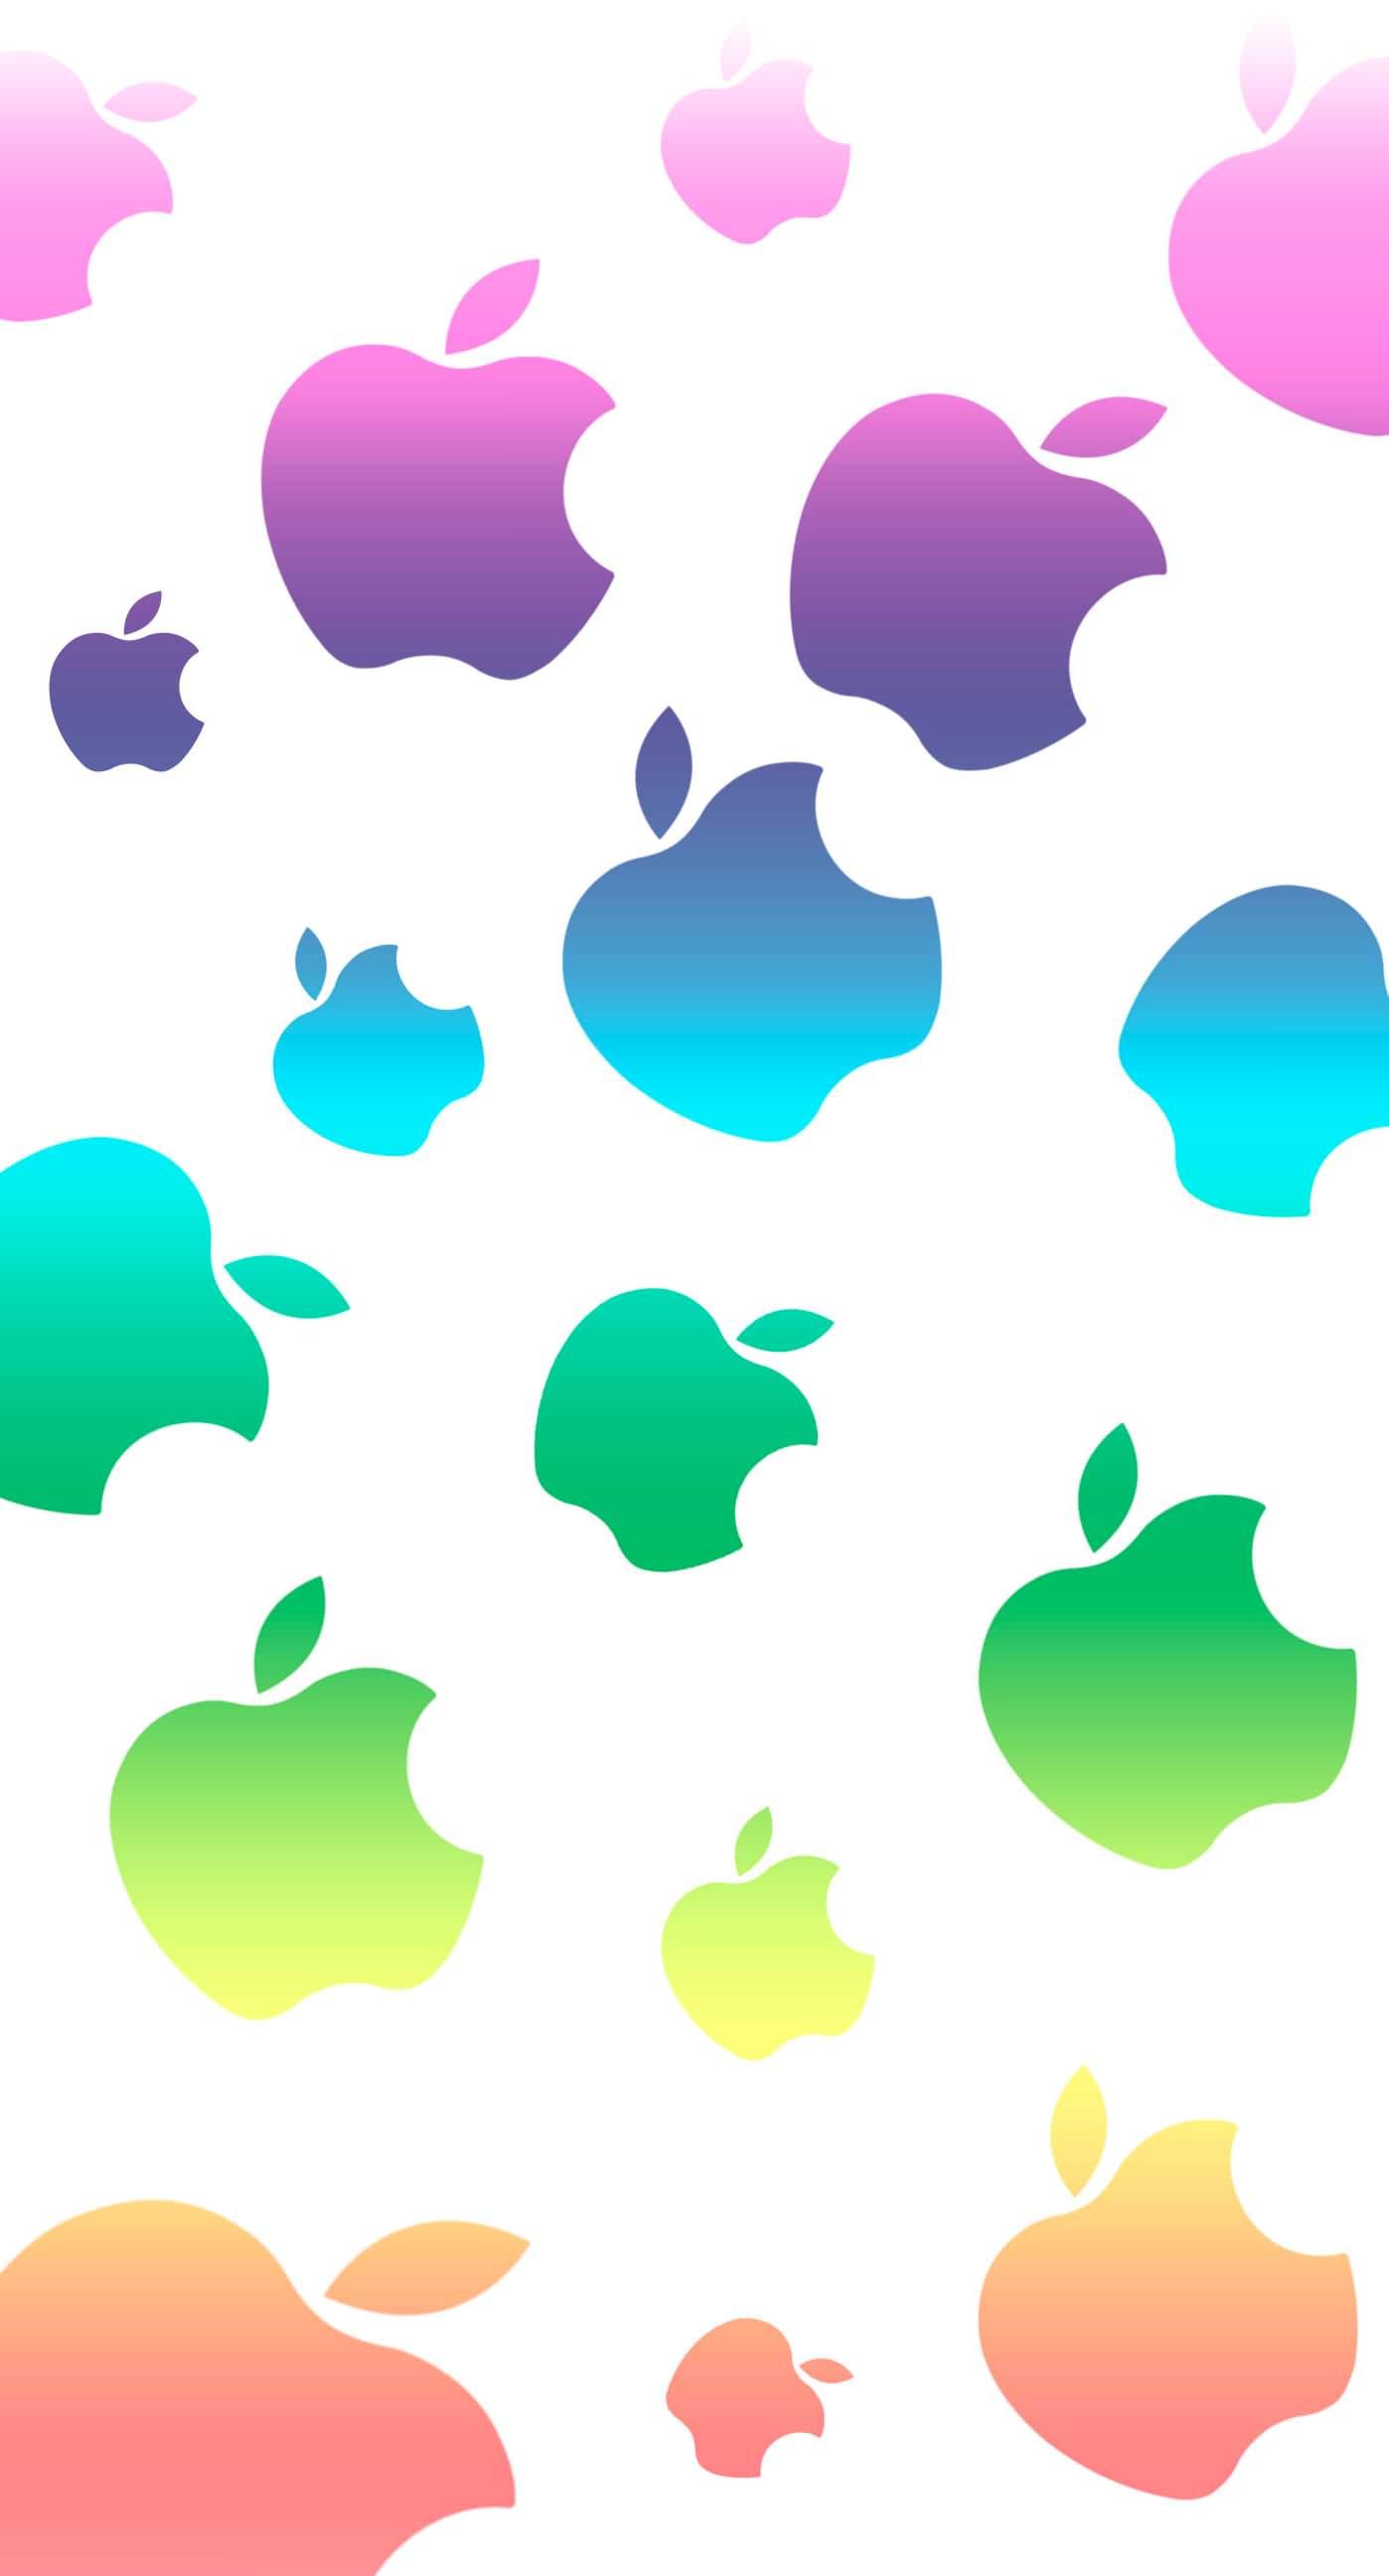 Iphone 6s用のかわいい壁紙 Iphone 6sのかわいい壁紙 1398x2592 Wallpapertip